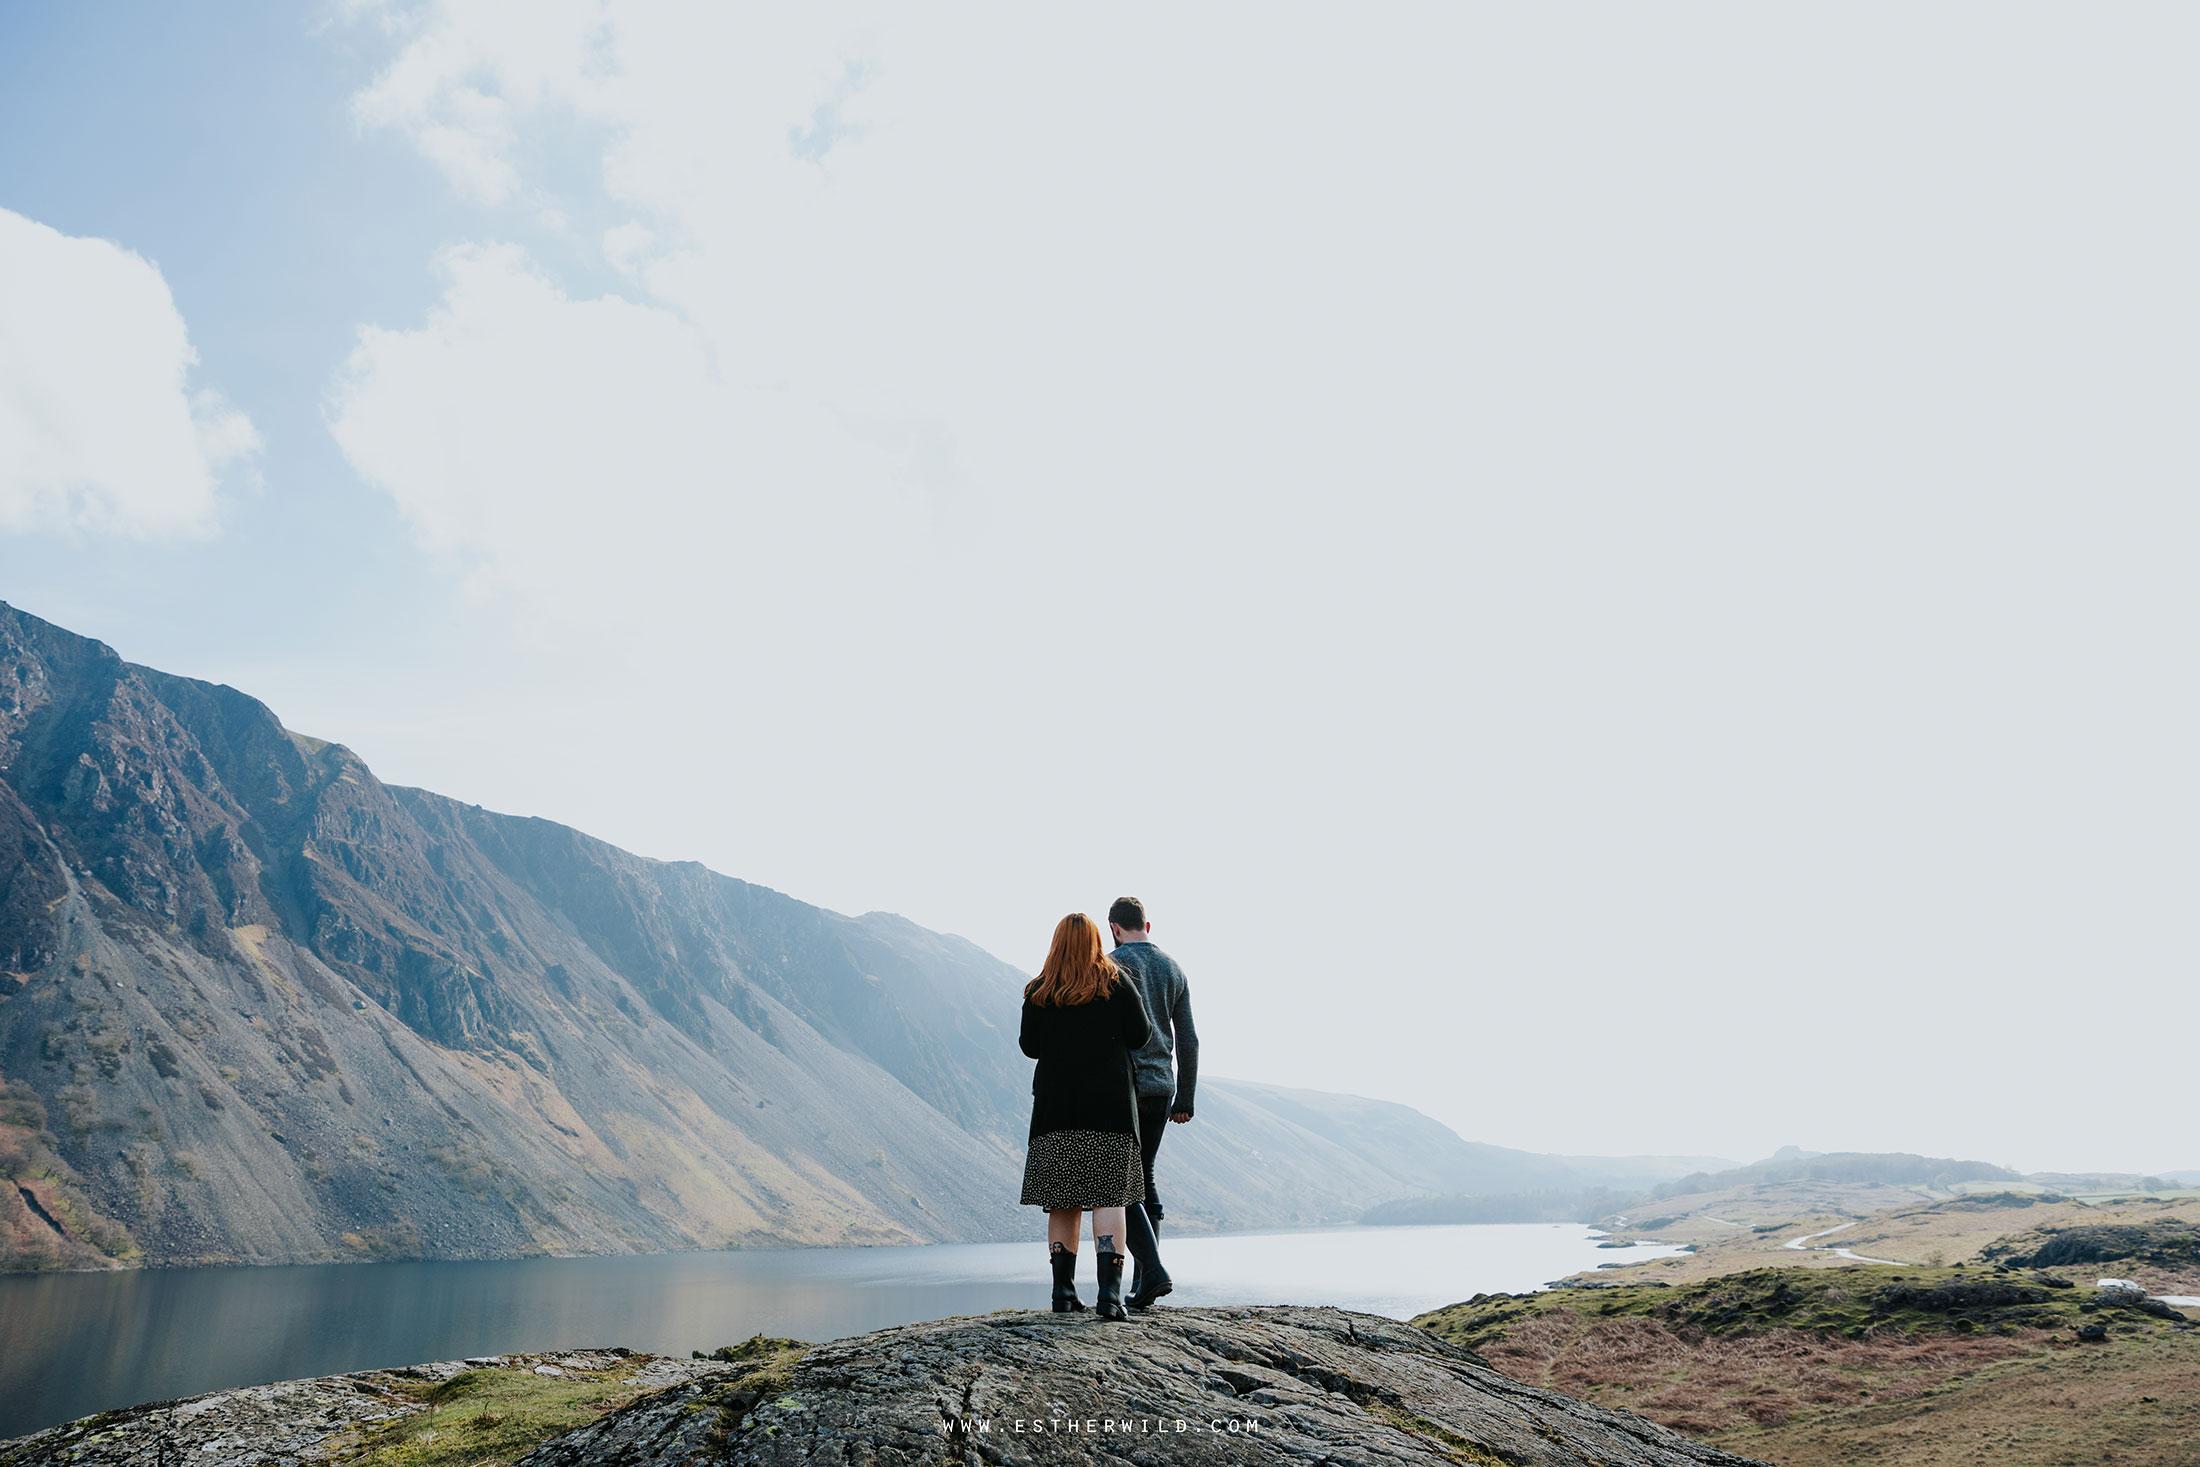 Cumbria_Lake_District_Wasdale_Wedding_Photographer_Destination_Engagement_Anniversary_Esther_Wild_IMG_3189.jpg